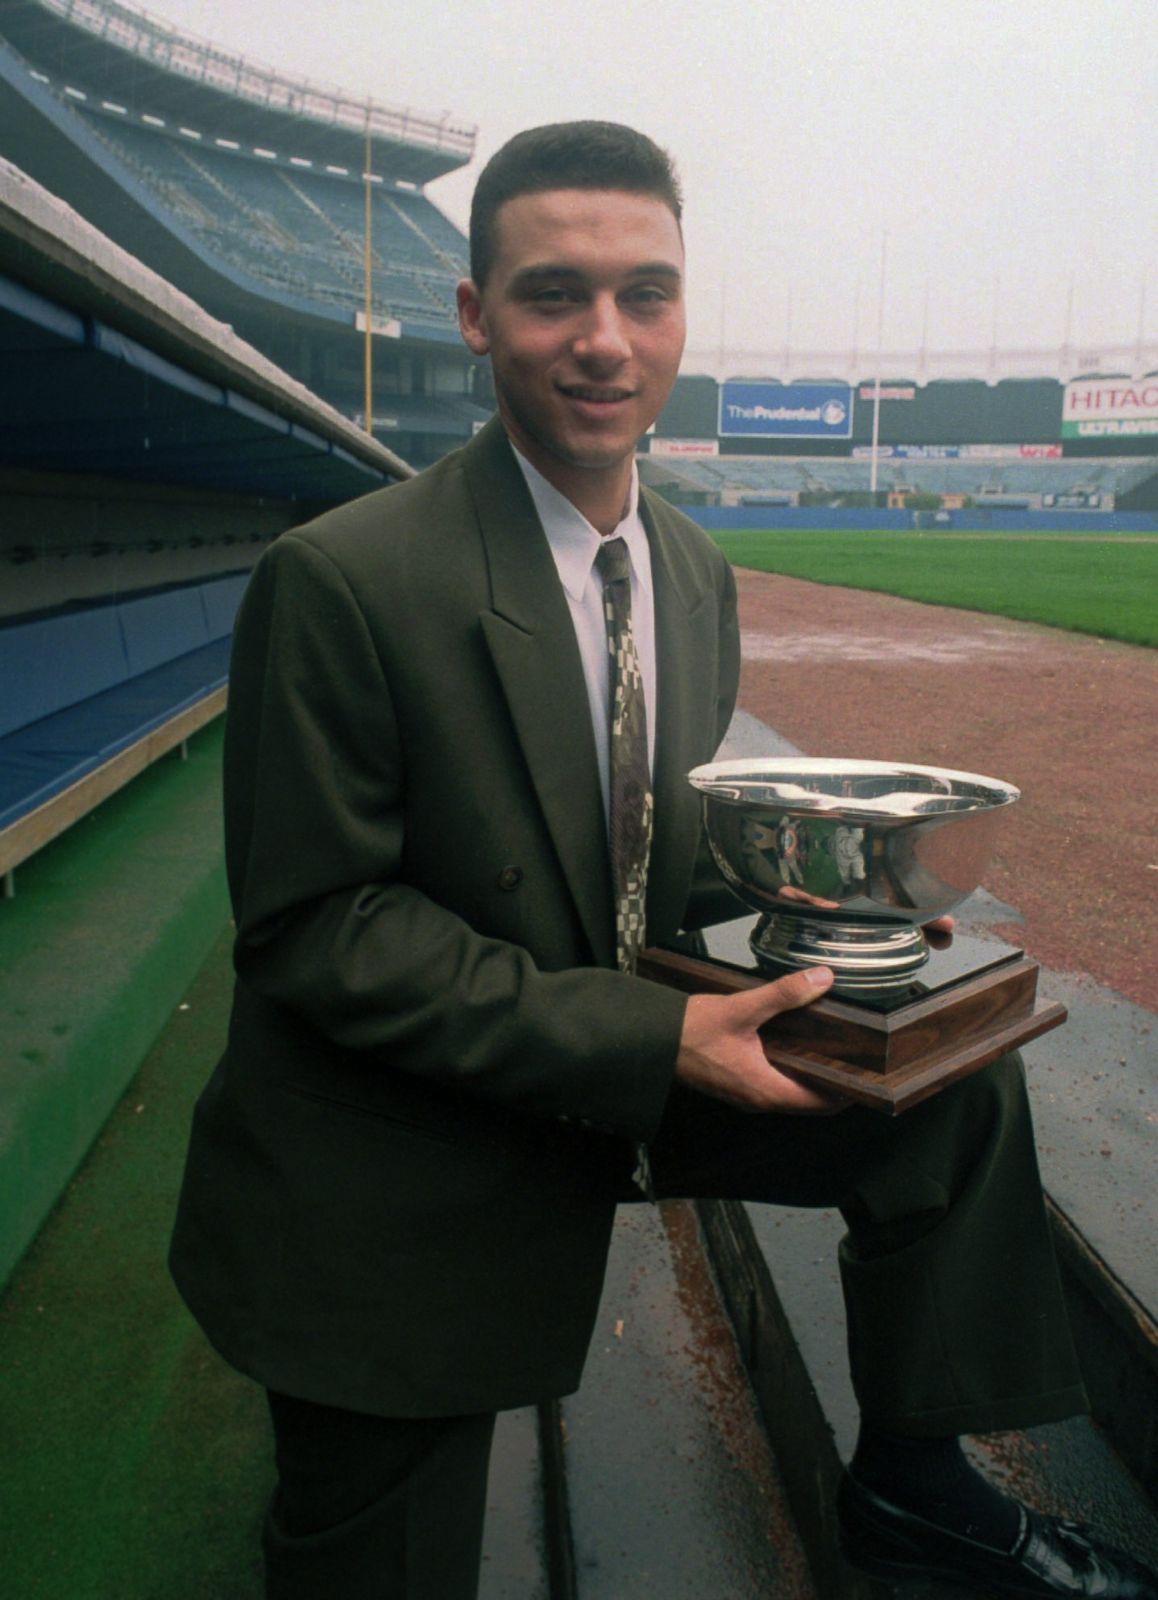 Derek Jeter 1996